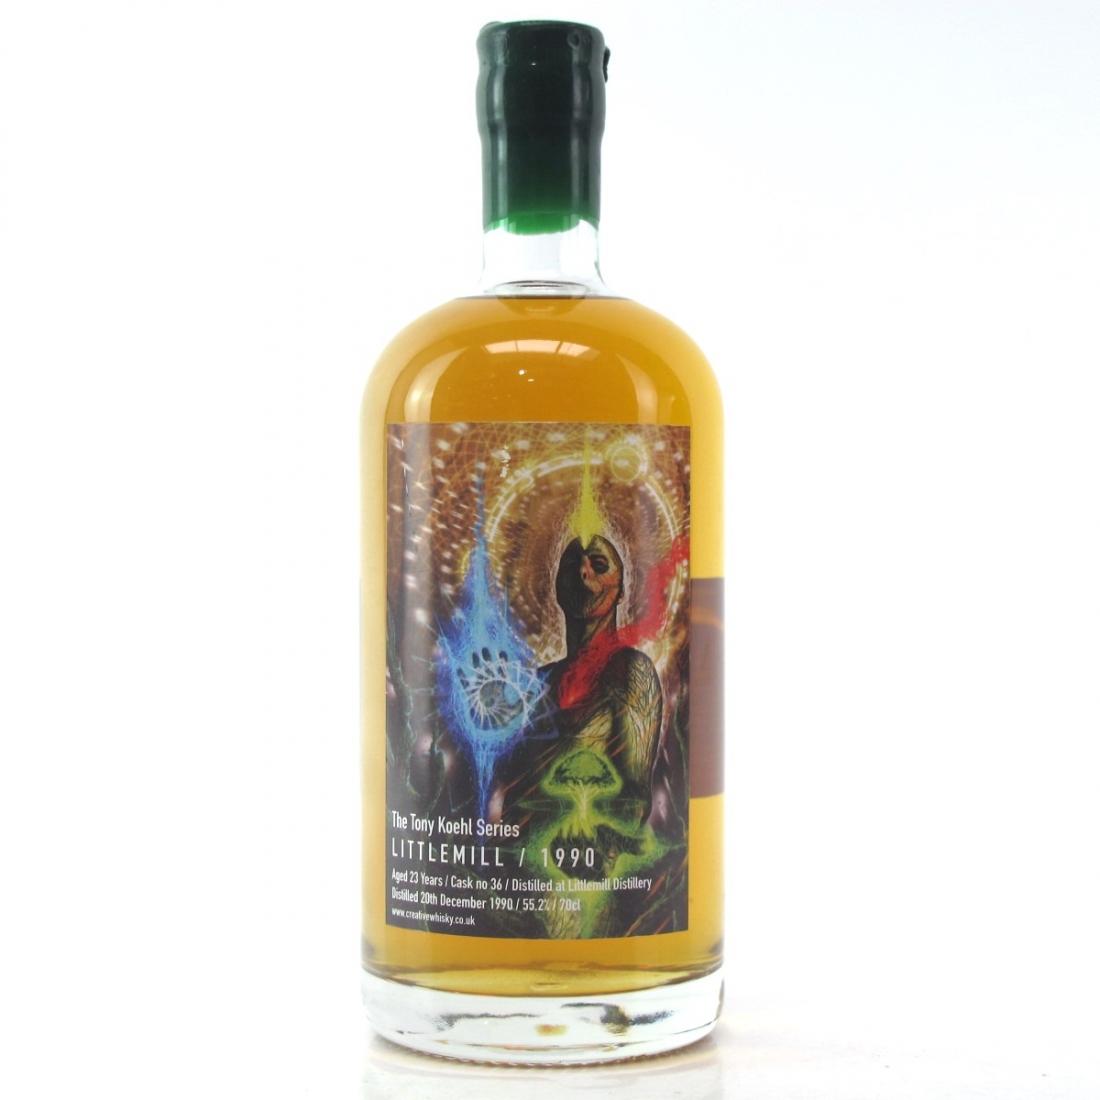 Littlemill 1990 Creative Whisky Co 23 Year Old / Tony Koehl Series